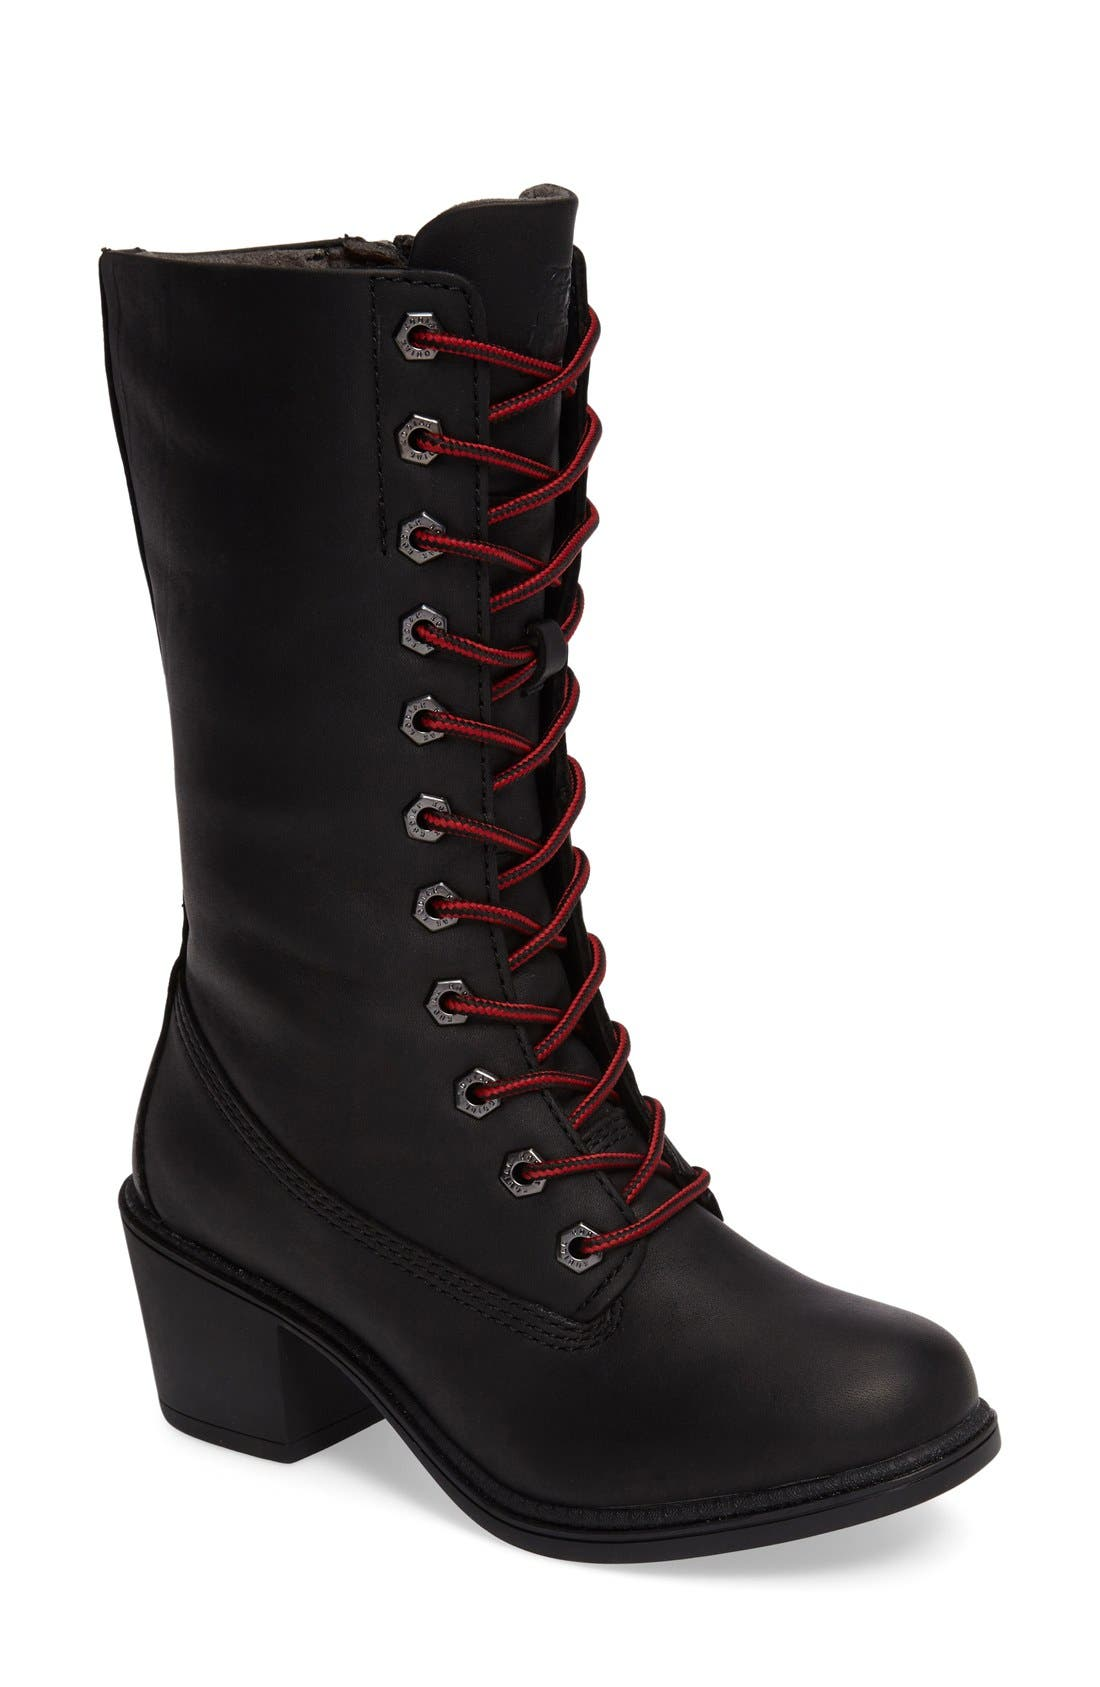 Alternate Image 1 Selected - Kodiak Nicole Waterproof Boot (Women)